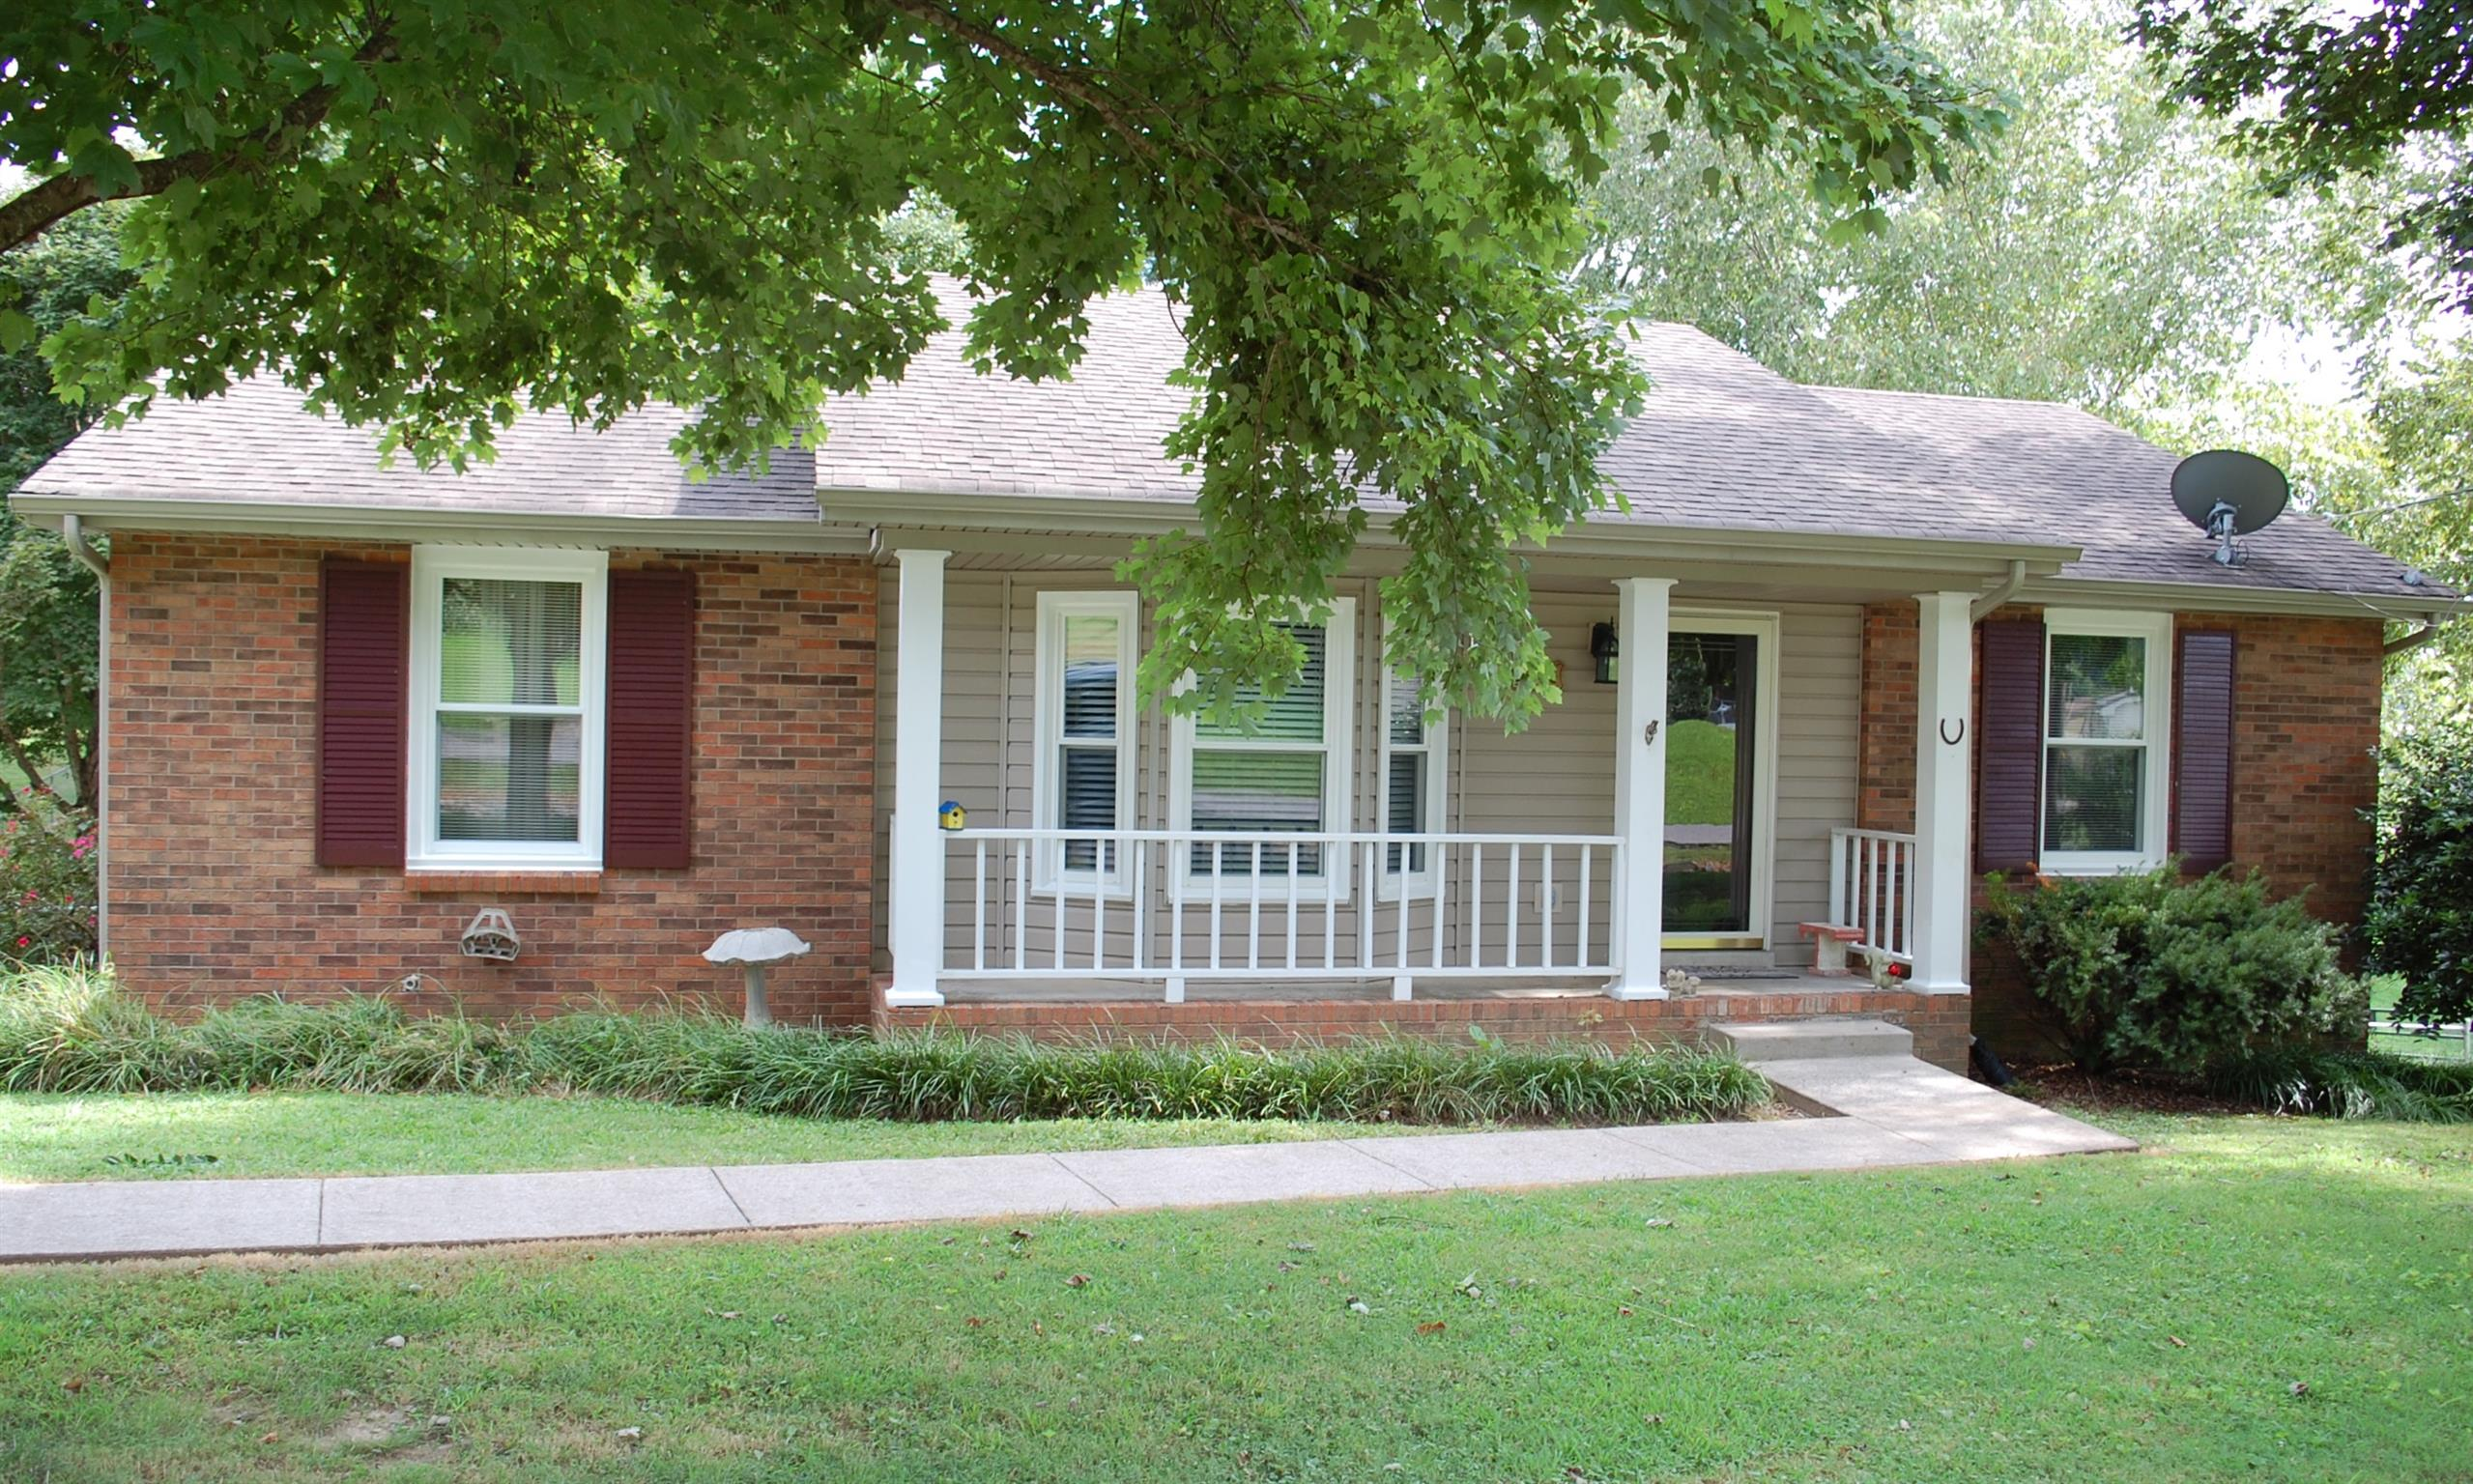 726 Clayton Dr, Clarksville, TN 37040 - Clarksville, TN real estate listing